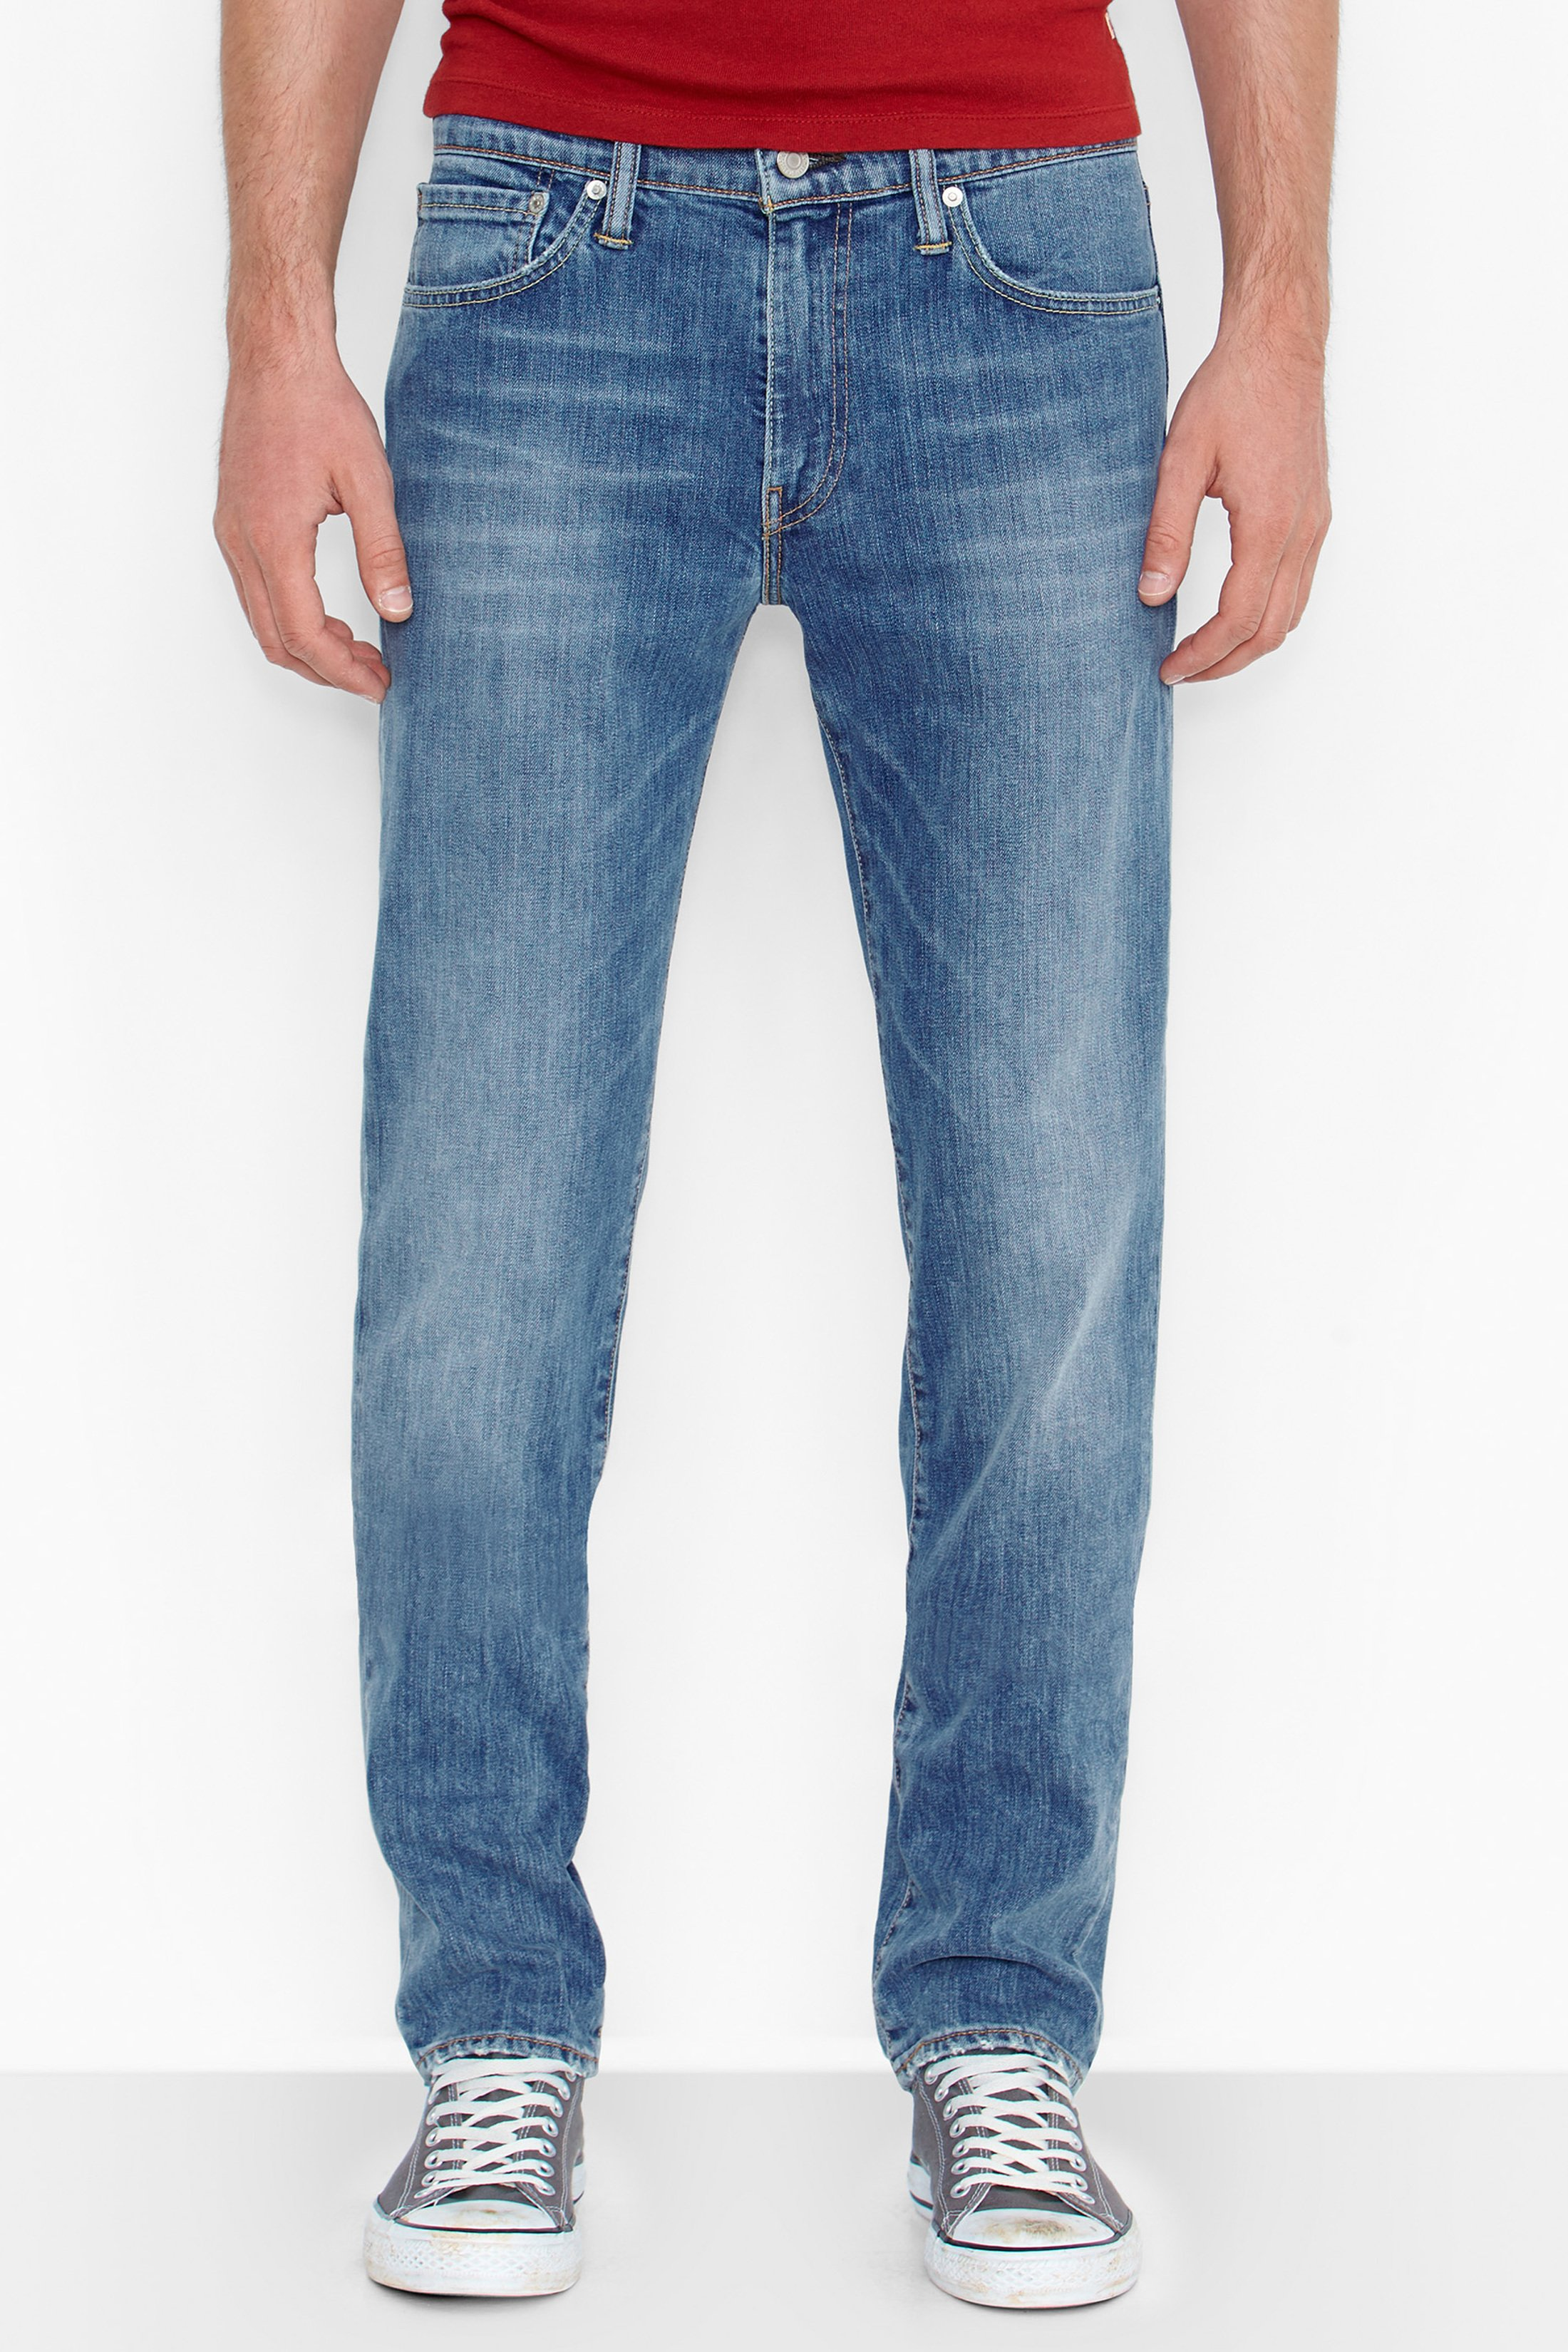 Levi's 511 Jeans Slim Fit Light Denim 1096